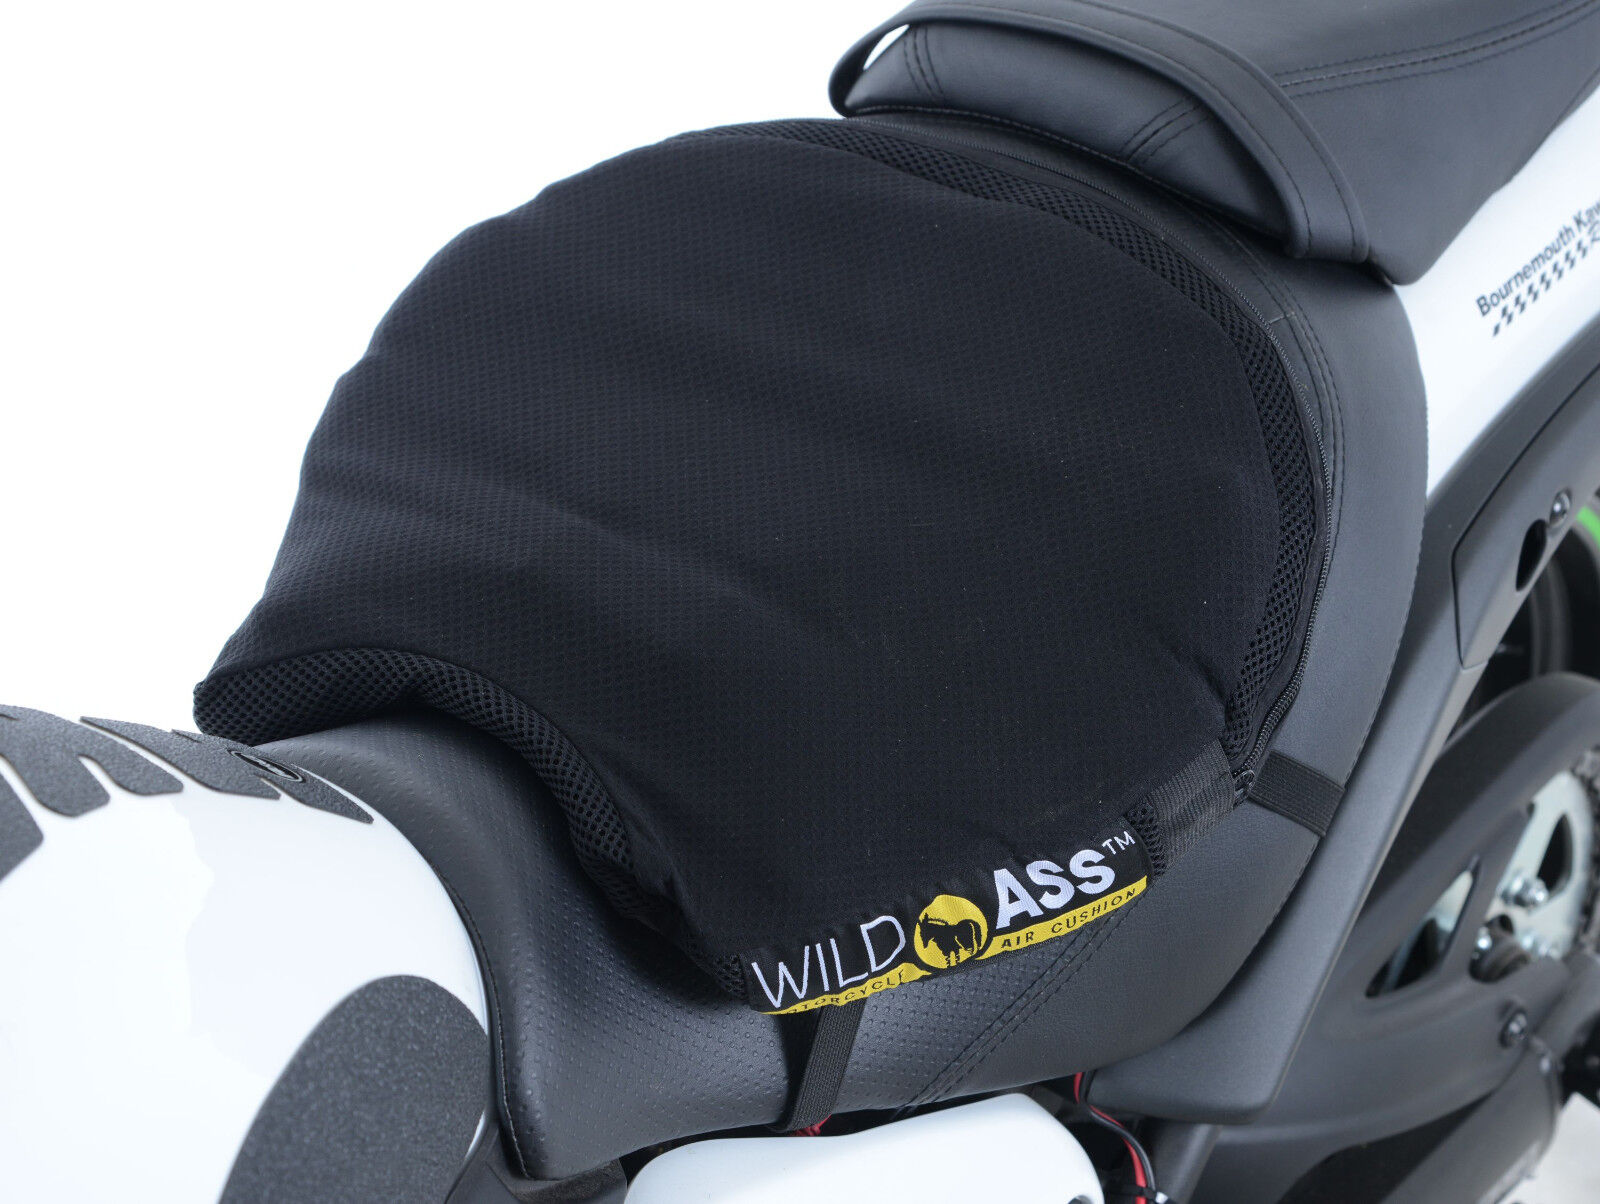 Details about Wild Ass Smart Lite Motorcycle Comfort Seat Cruiser Touring  Medium 39 5x36x5 cms